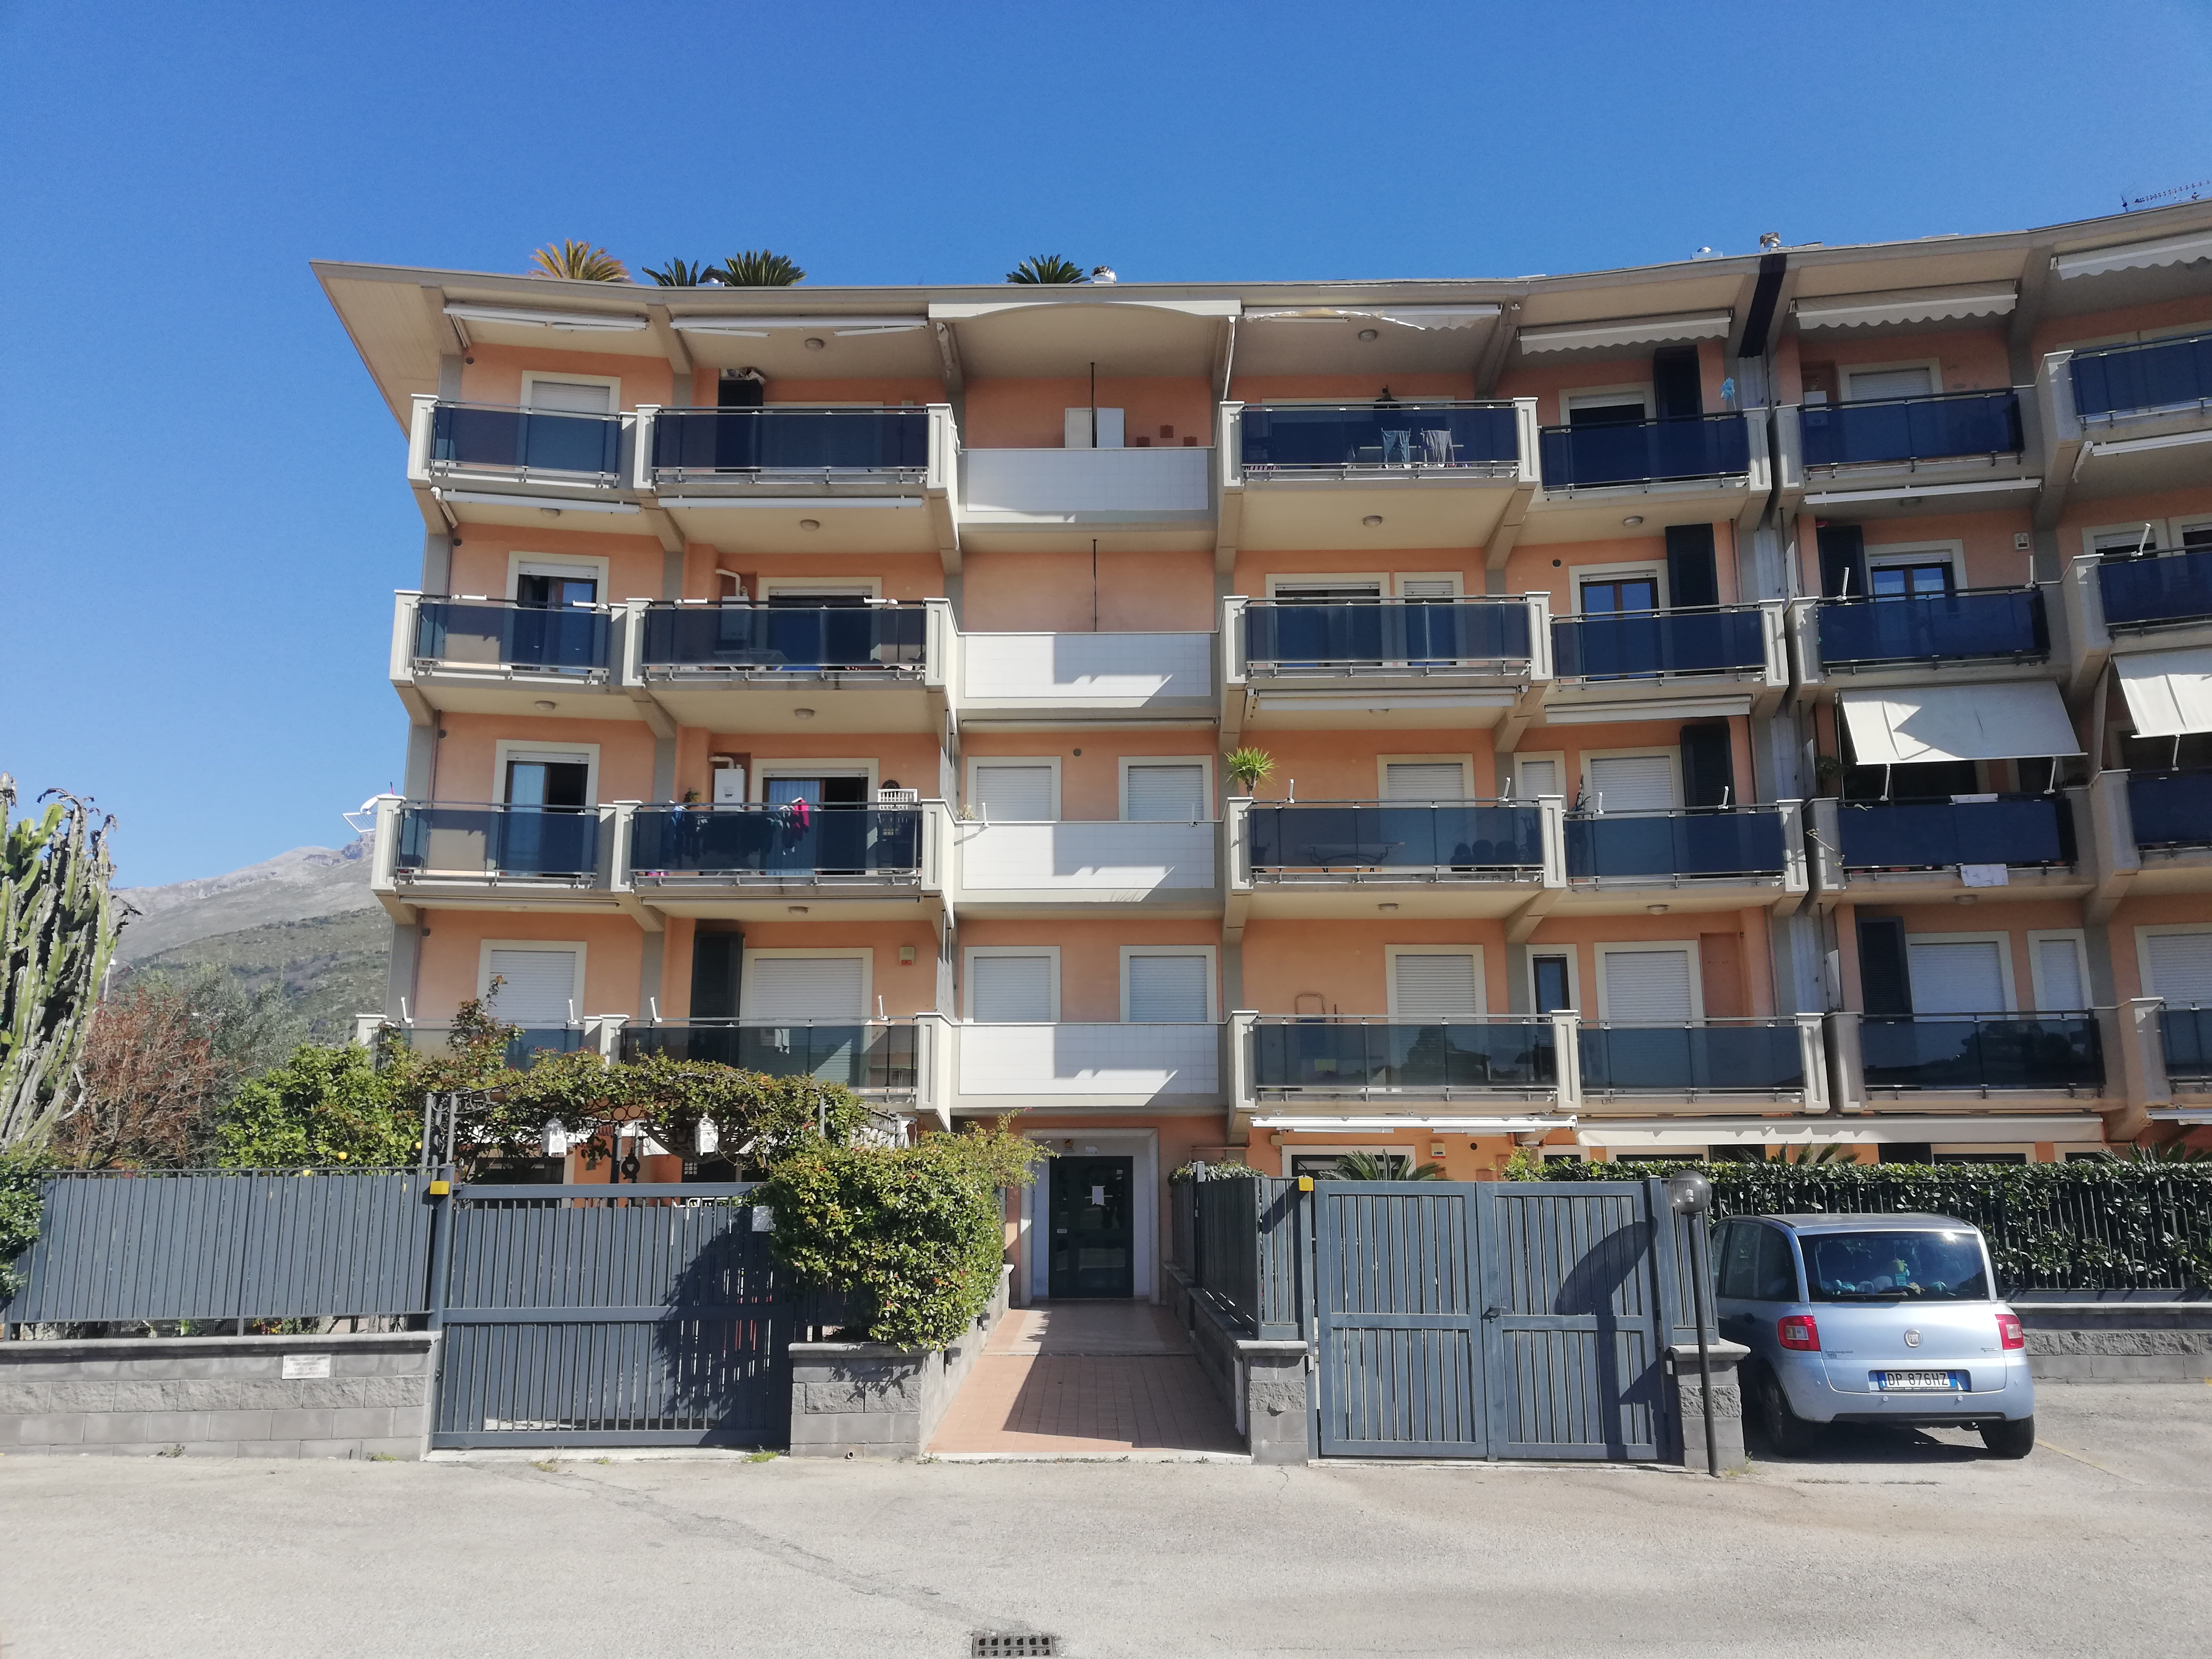 Rif. A341 Formia Parco La Fontana